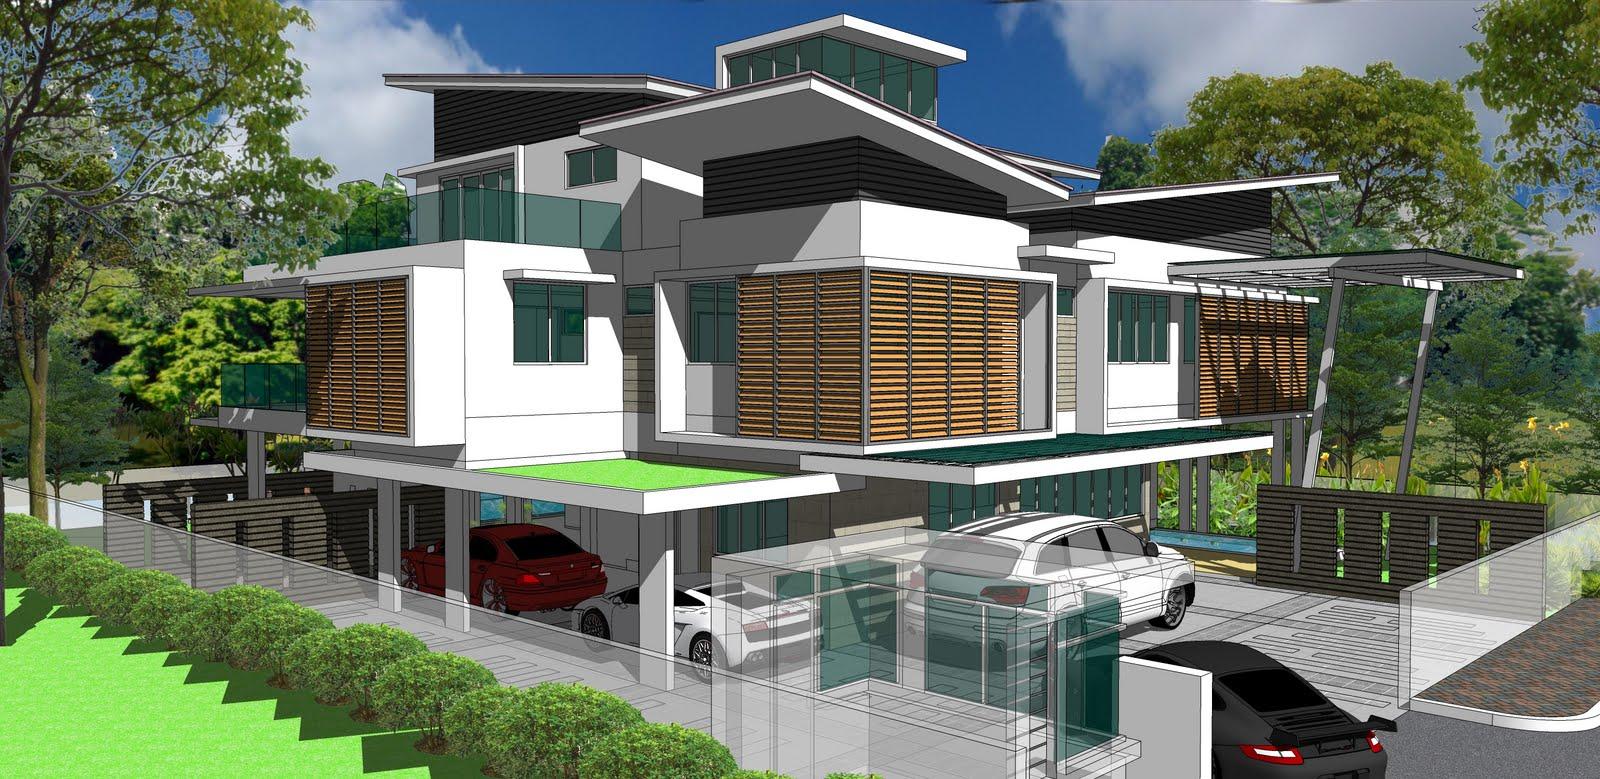 Bungalow House Design Malaysia 25711 Wallpapers Home Bungalow Malaysia Modern Design 1600x779 Download Hd Wallpaper Wallpapertip